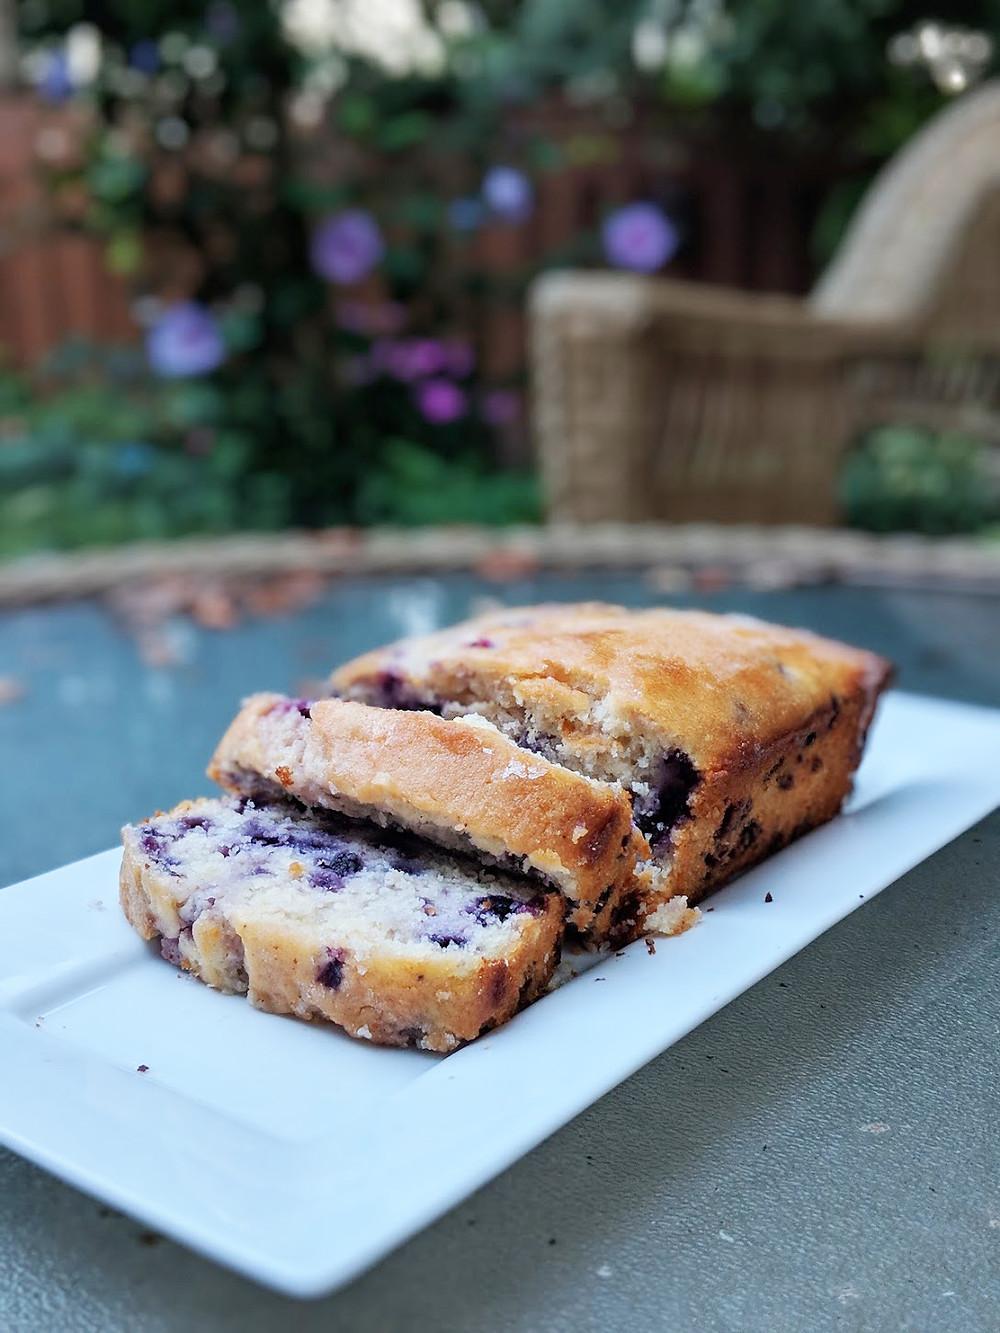 Dairy-free lemon blueberry bread made with Original Hippie Mylk